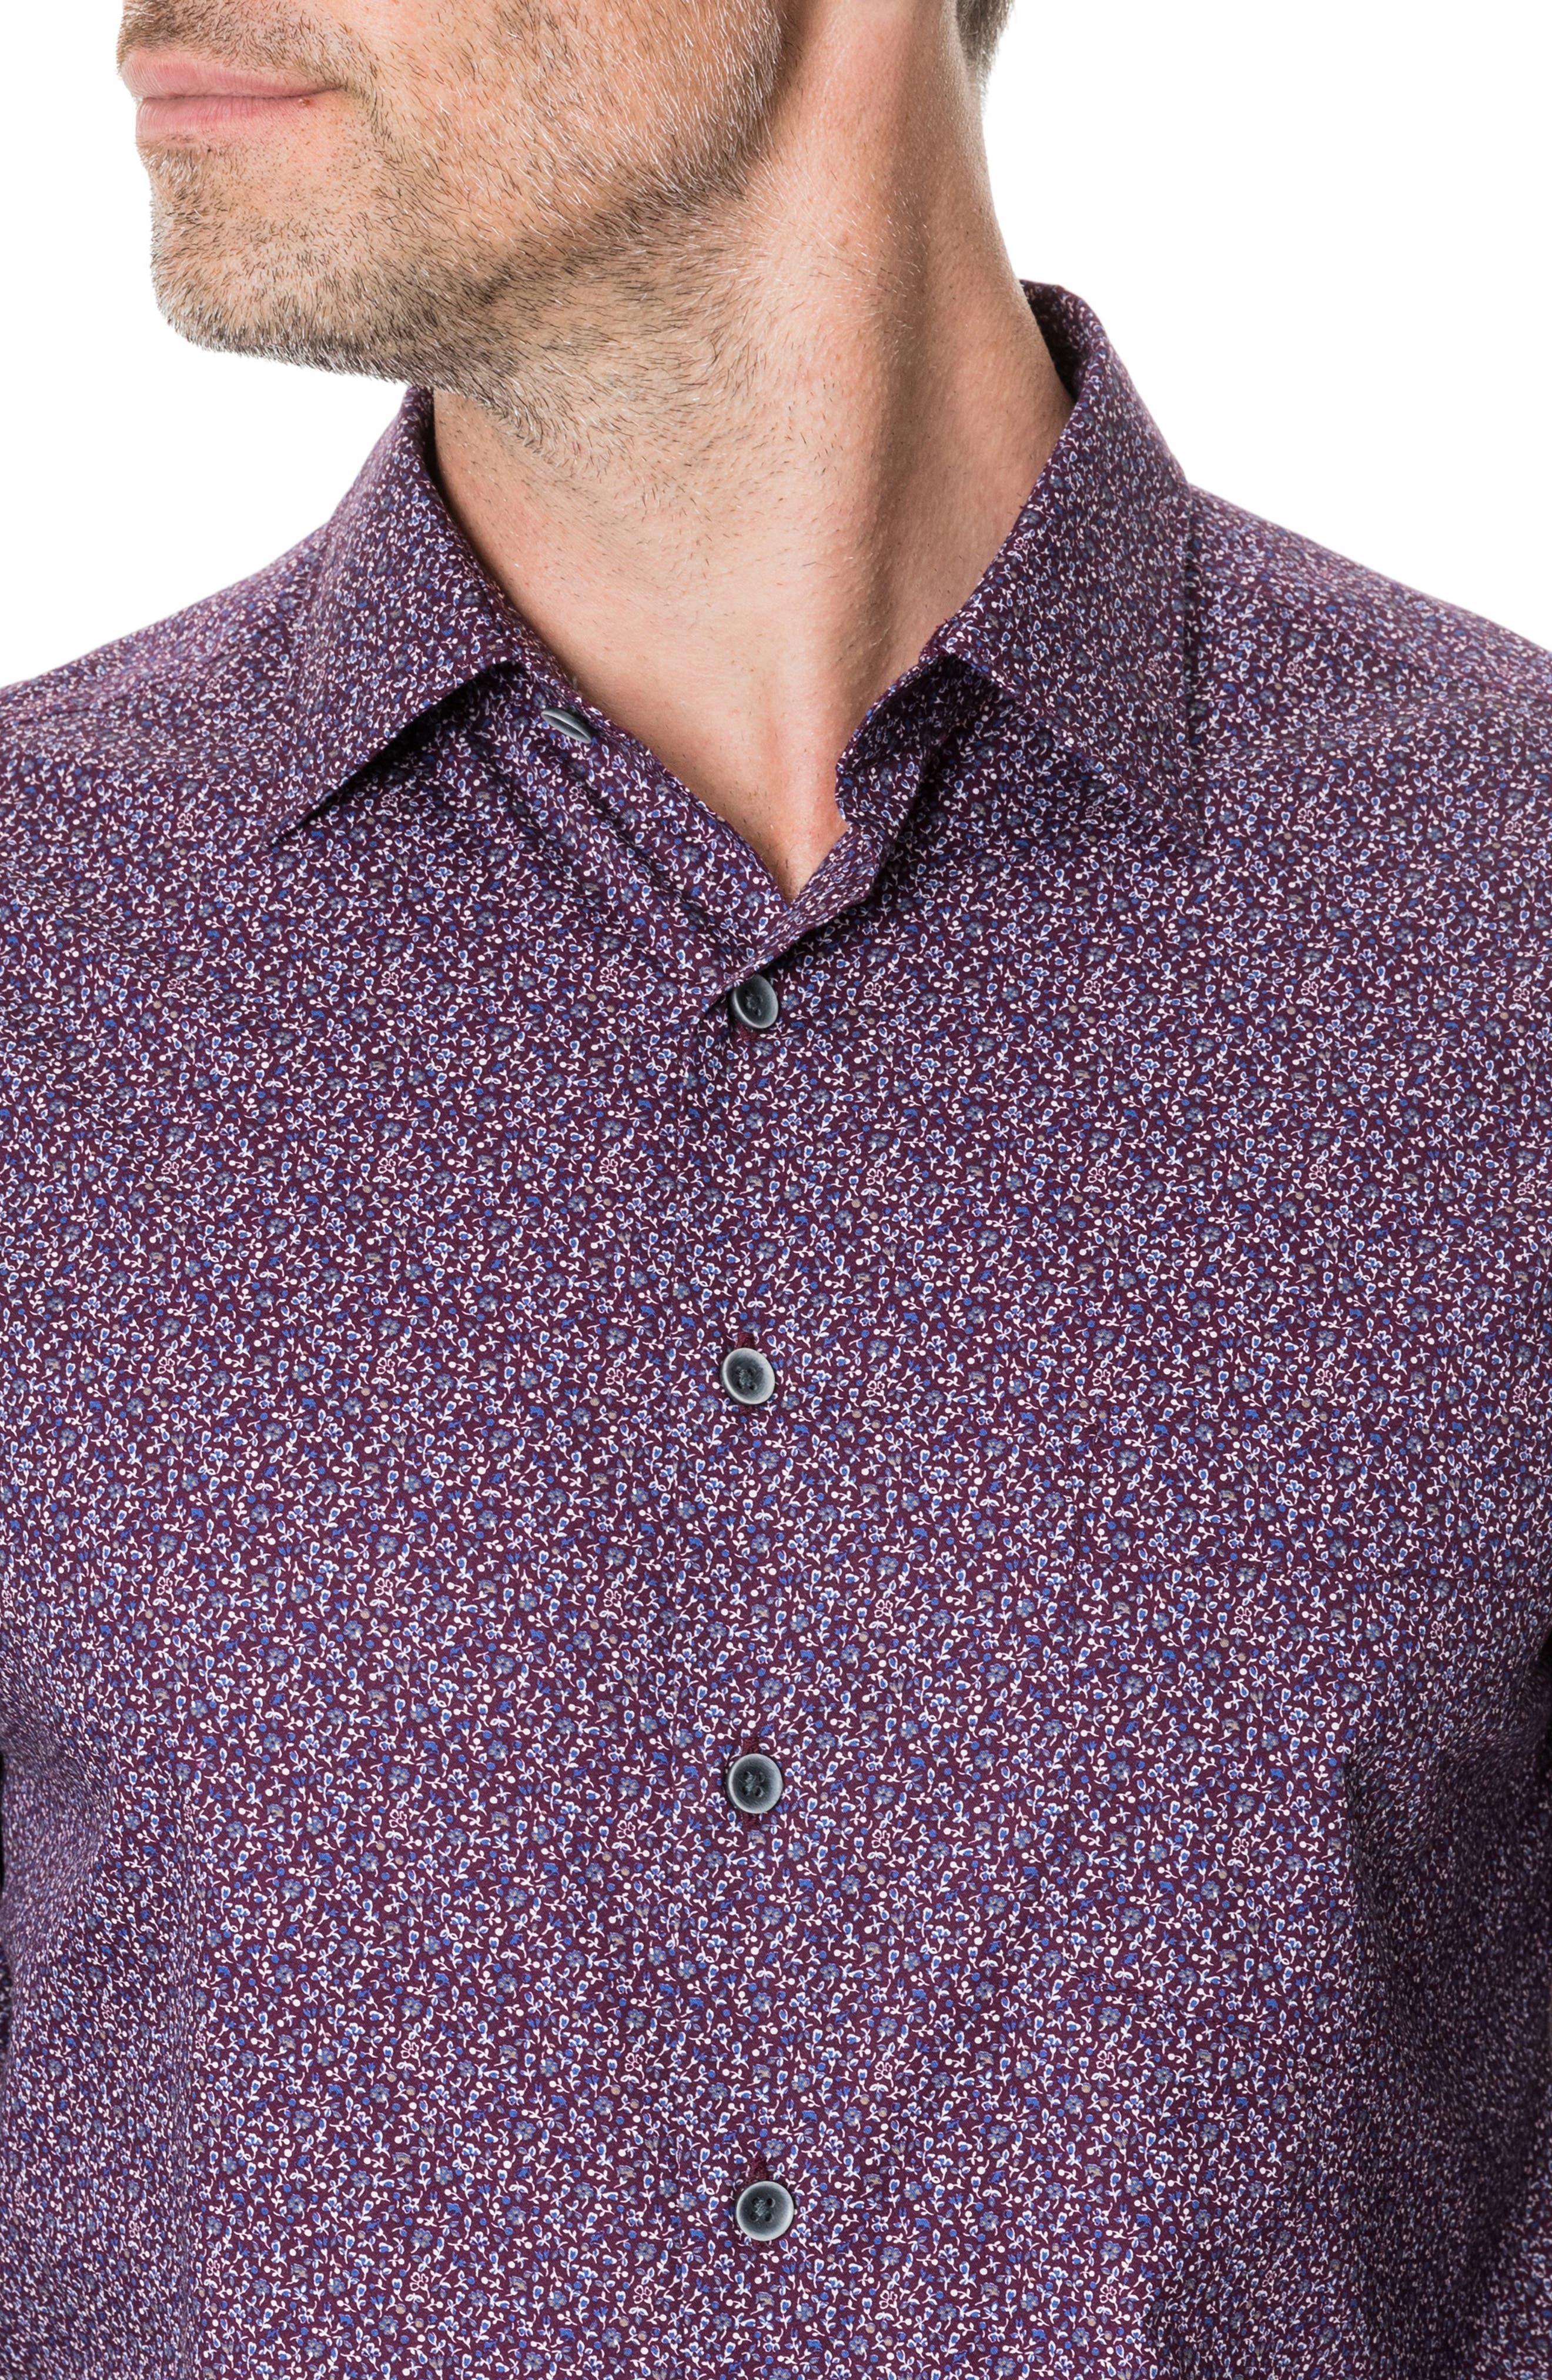 Scotland Street Regular Fit Floral Sport Shirt,                             Alternate thumbnail 2, color,                             PLUM PURPLE